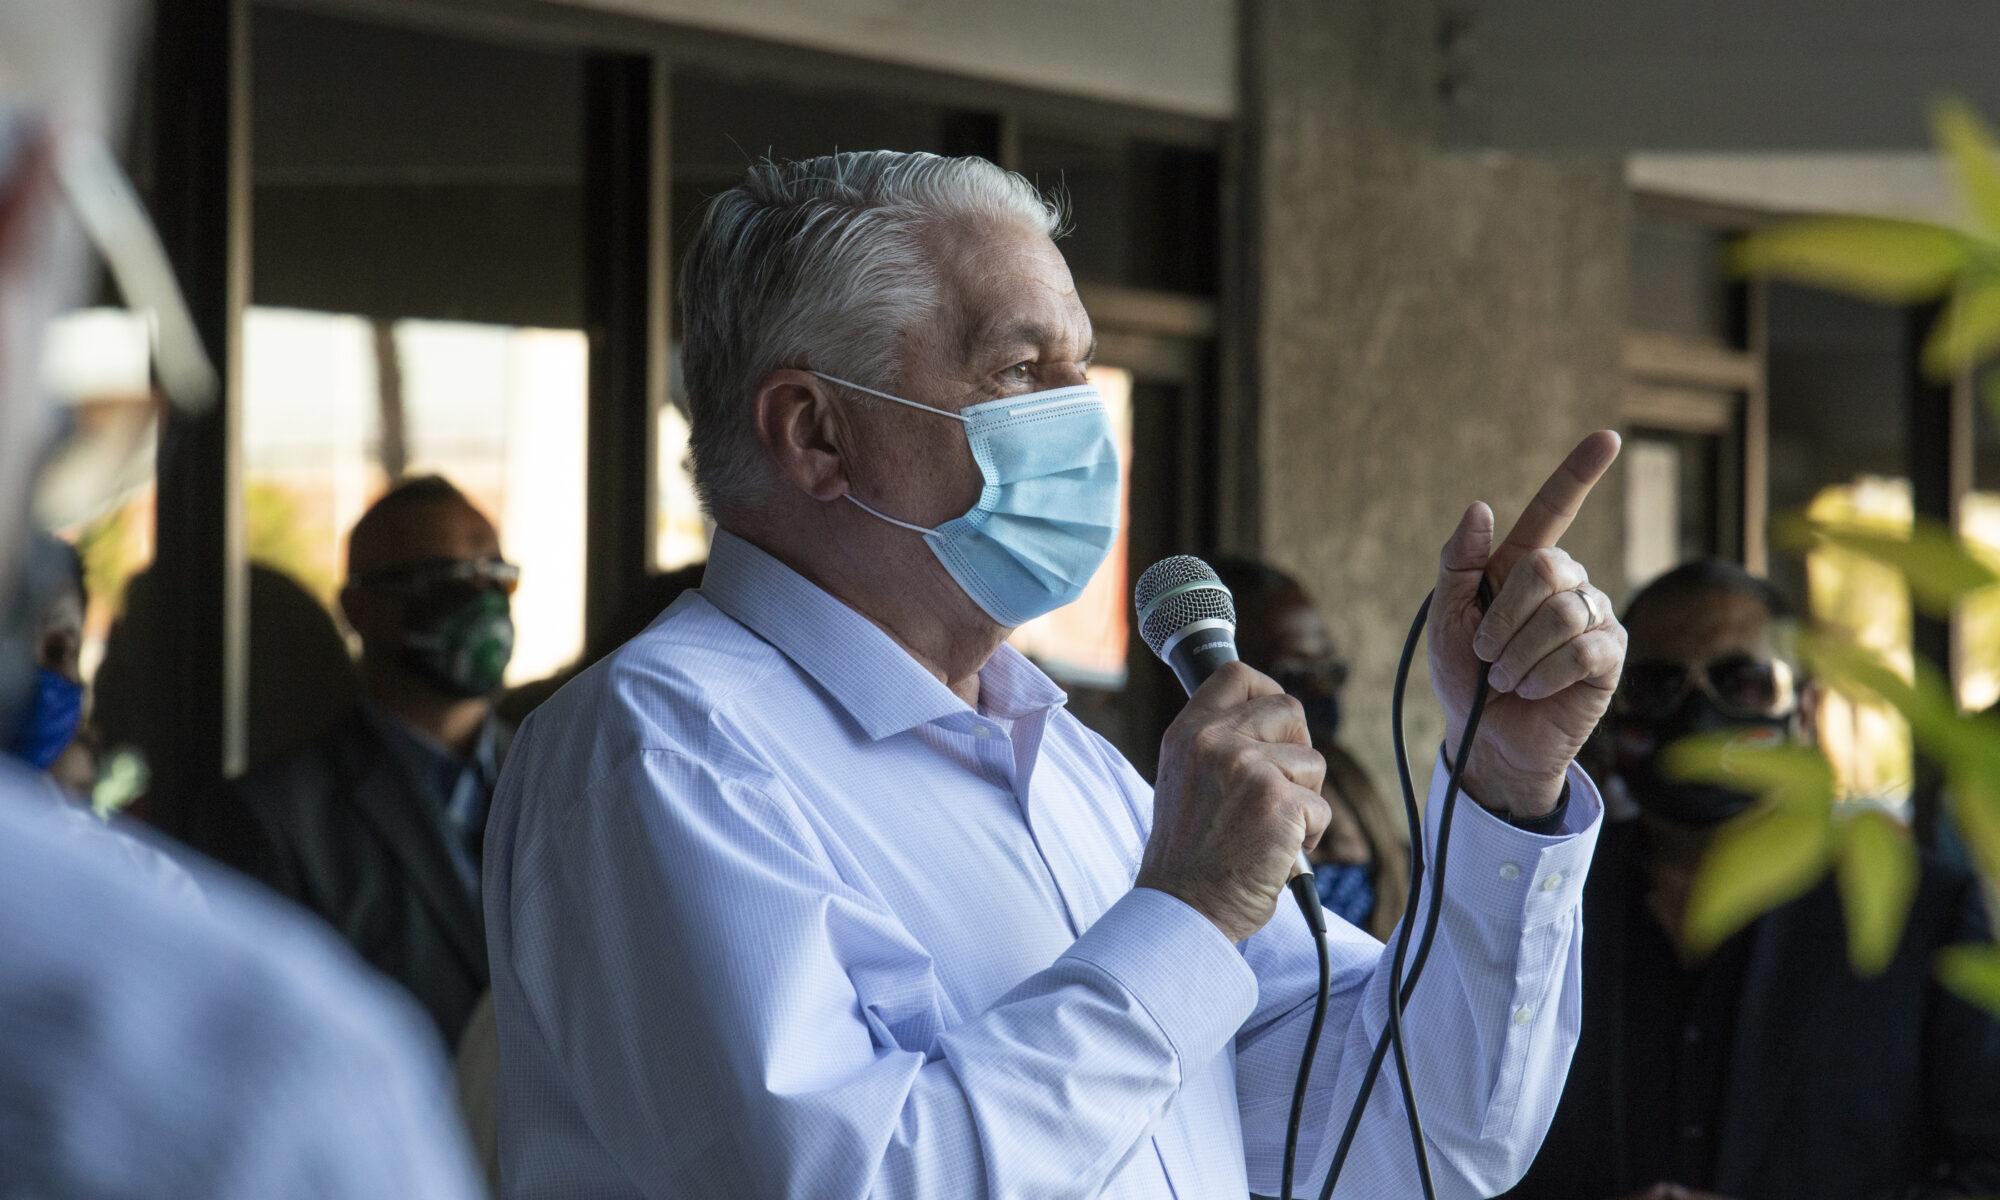 Nevada Governor Steve Sisolak speaks during an event